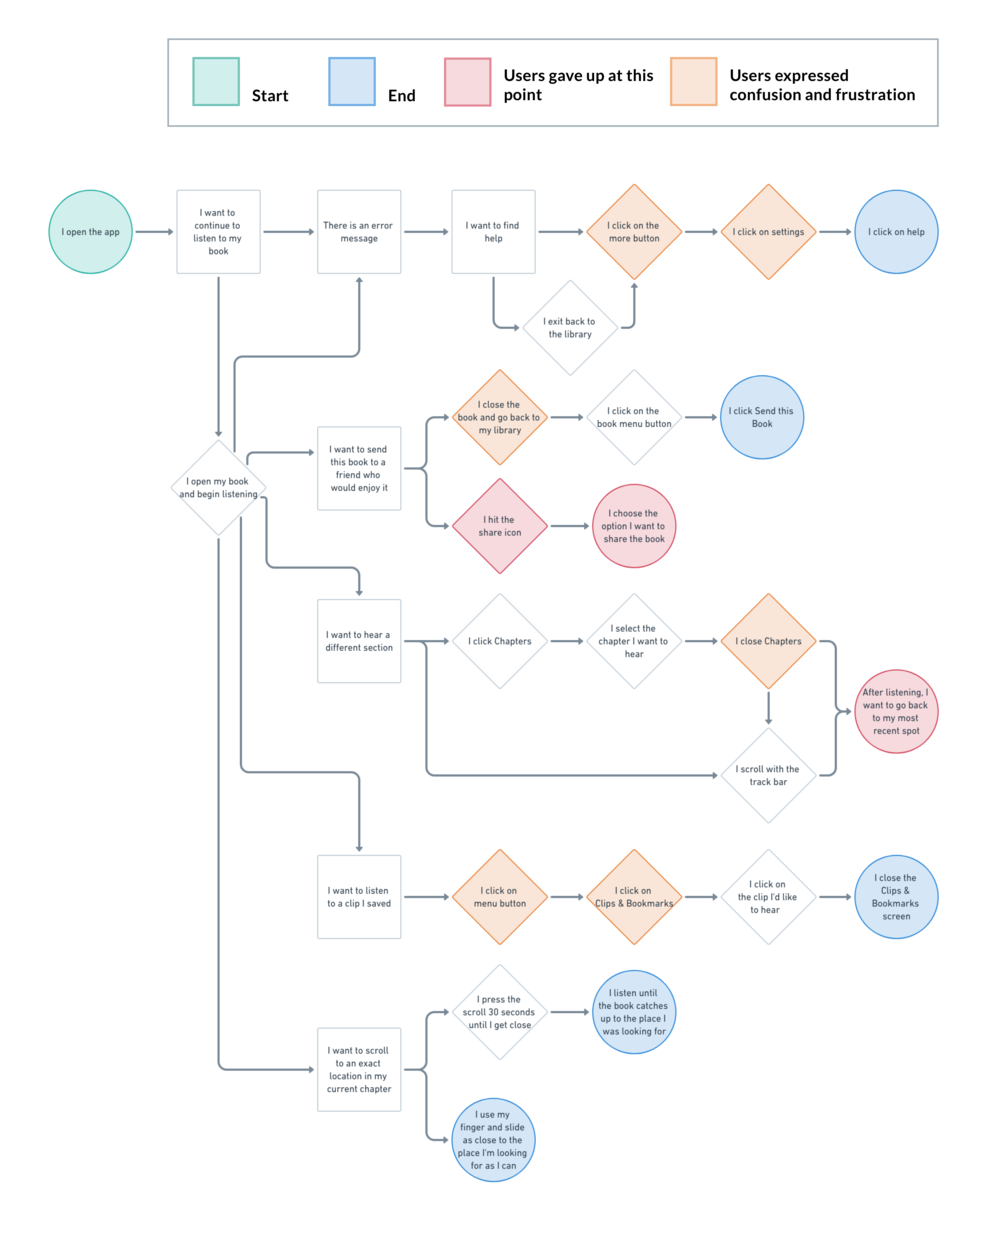 Task flow based on Audible's current UI